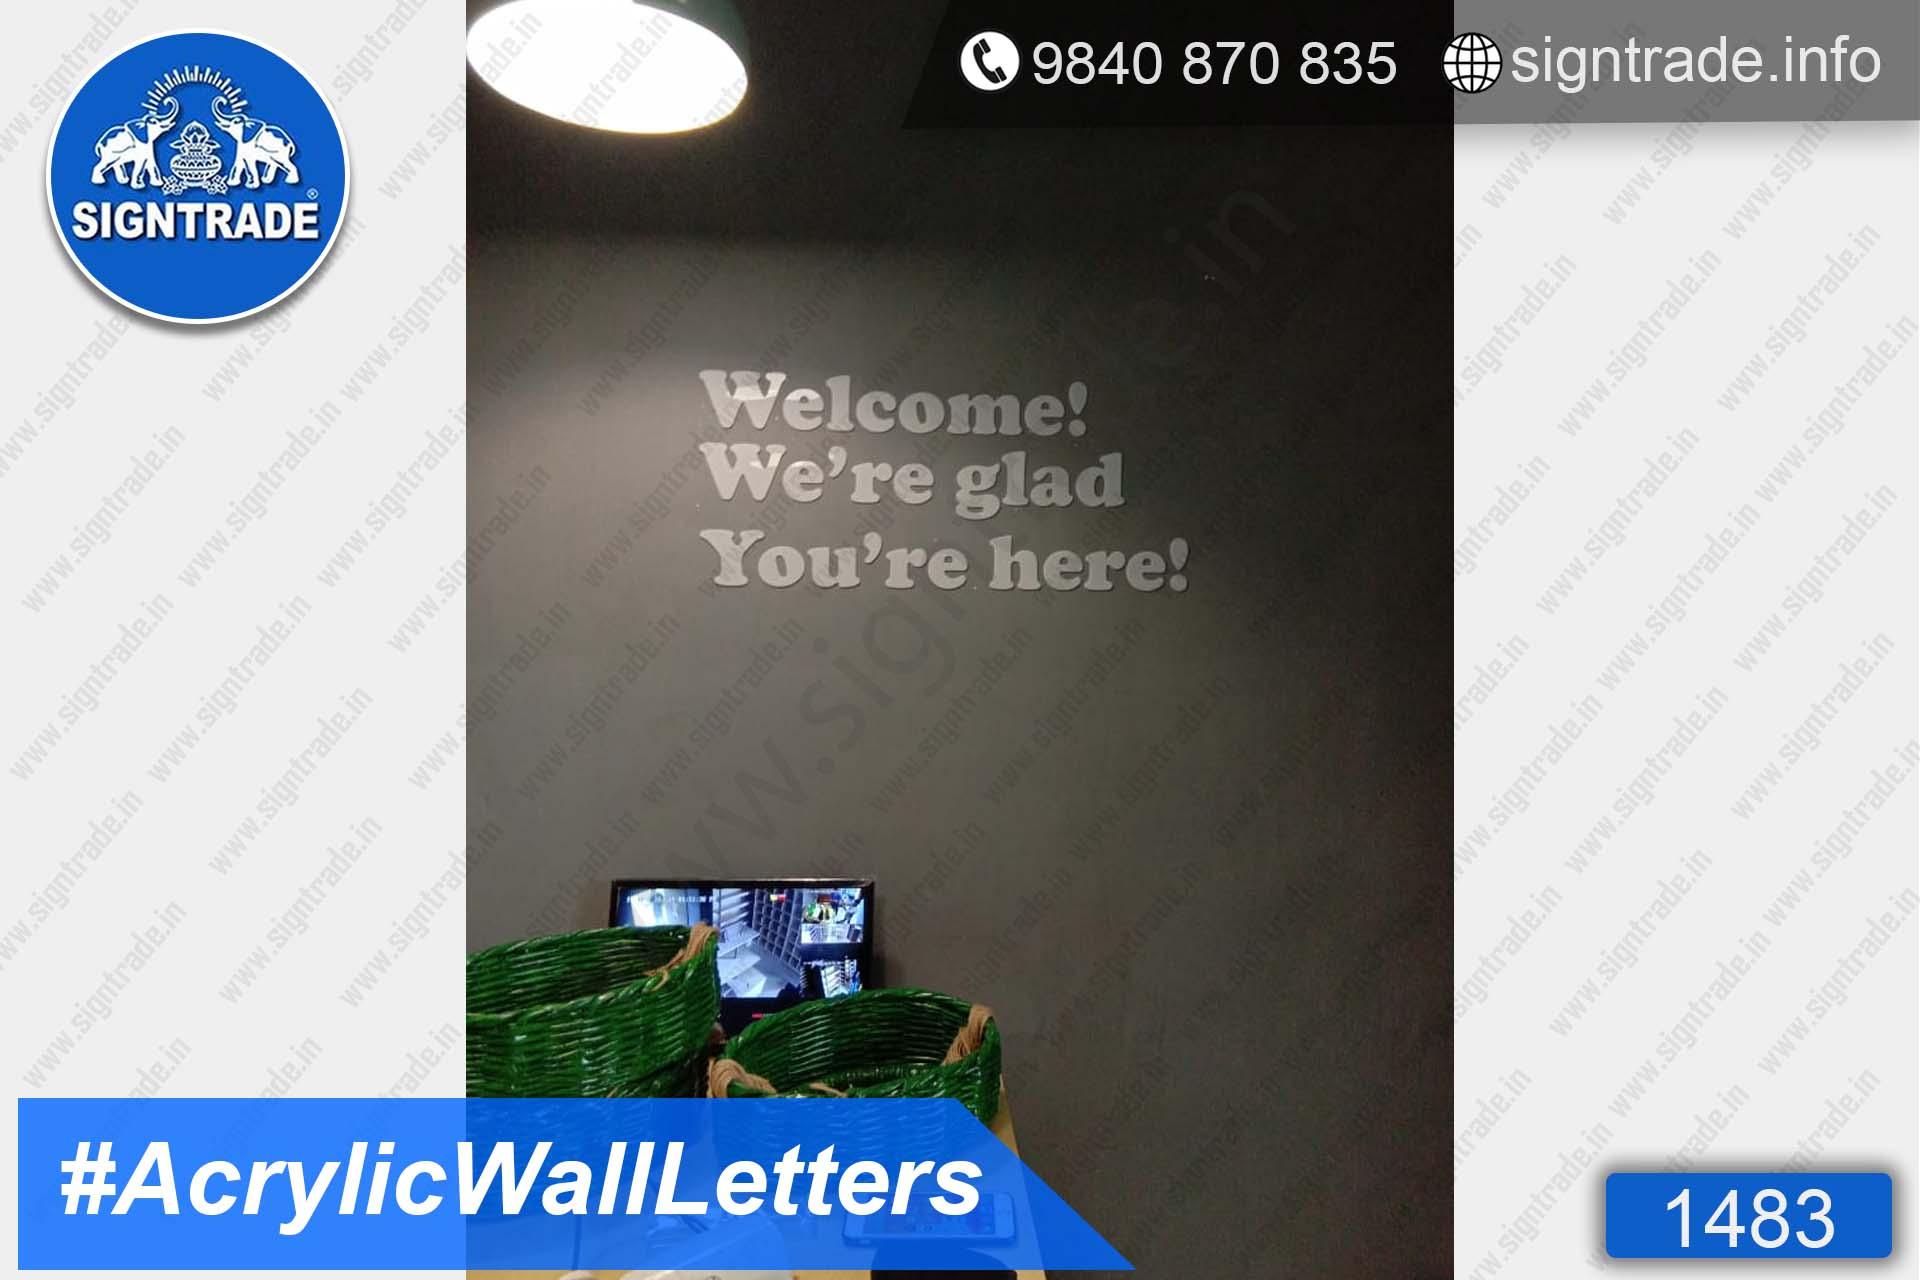 Dhaba, Valasaravakkam, Chennai - SIGNTRADE - Acrylic ACP, LED Sign Board Manufacturers in Chennai